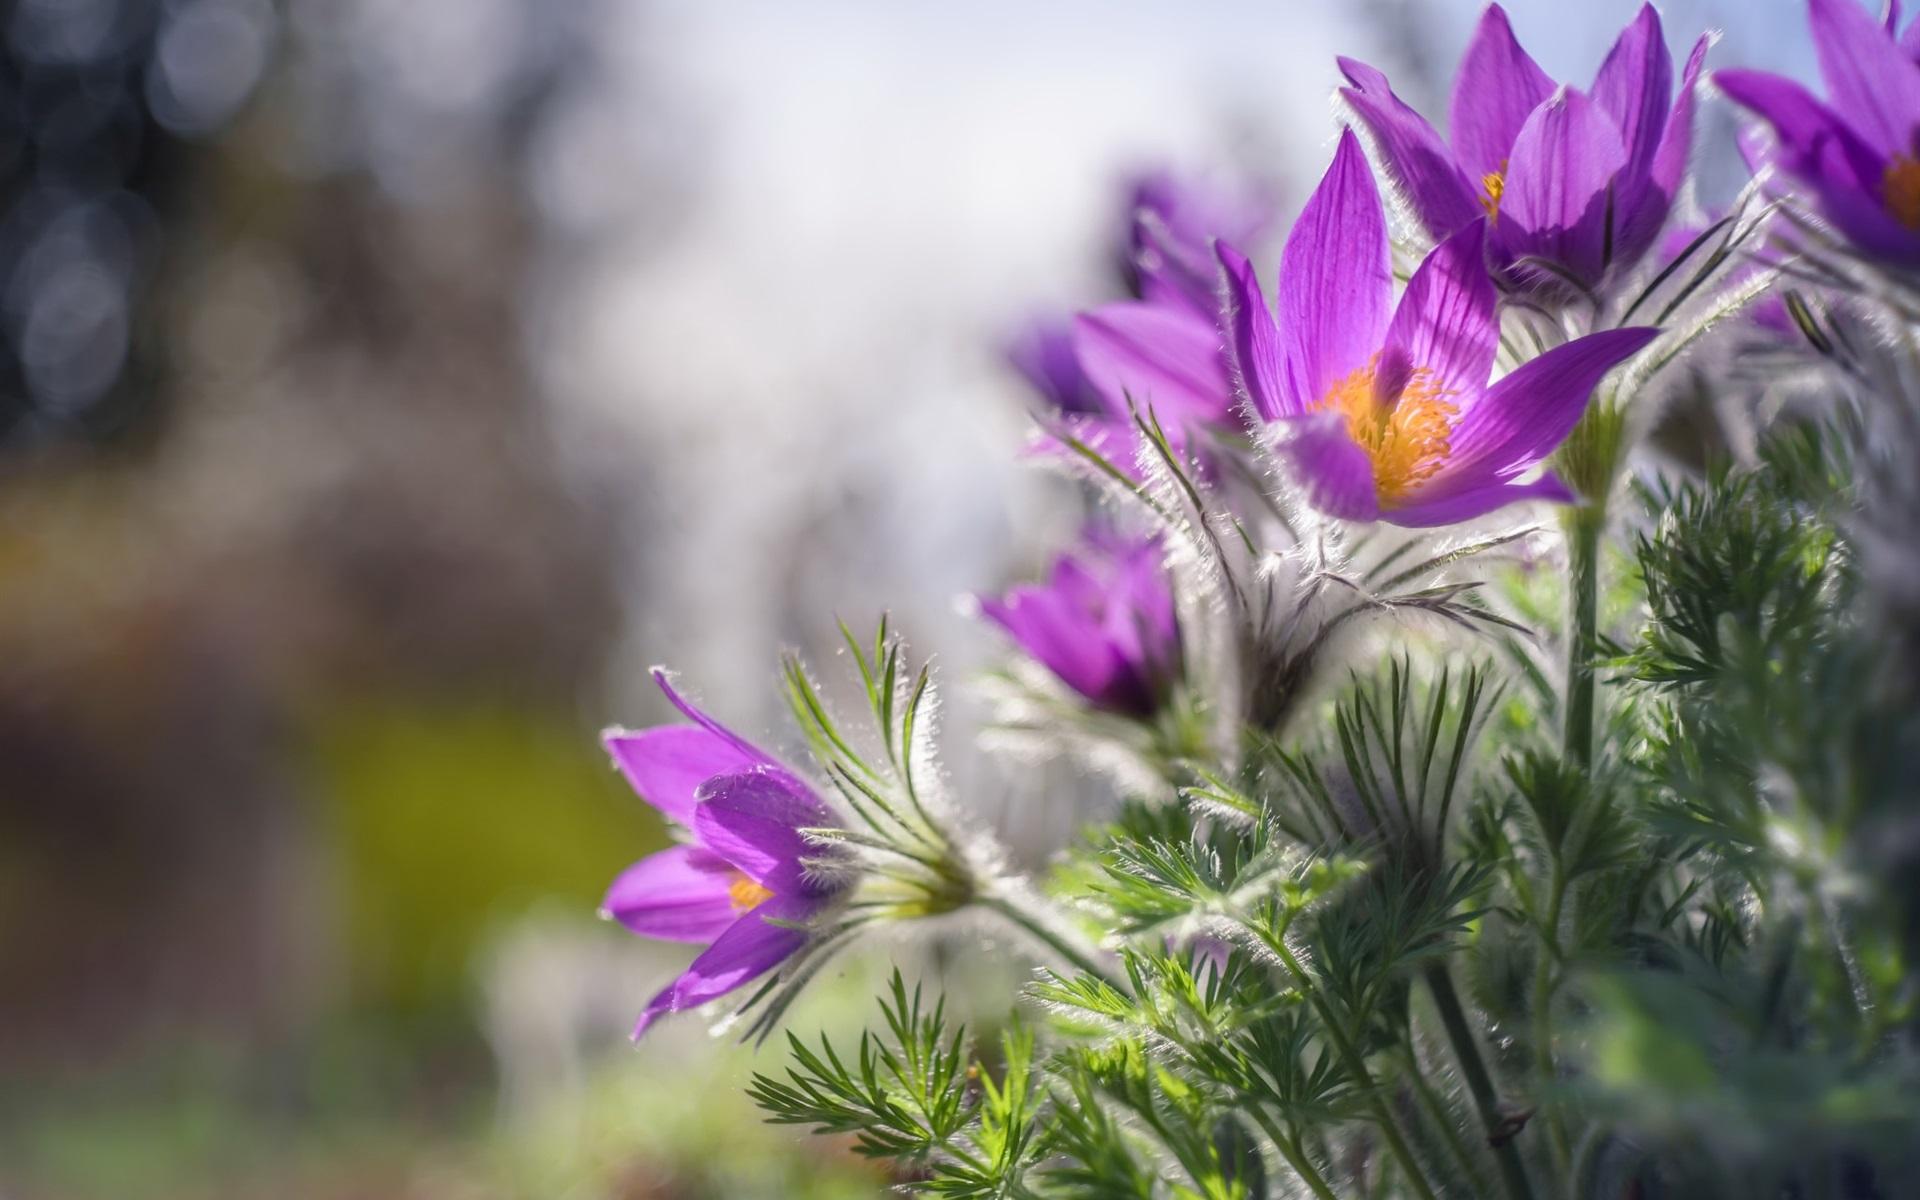 Wallpaper Sleep Grass Spring Purple Flowers 1920x1200 Hd Picture Image